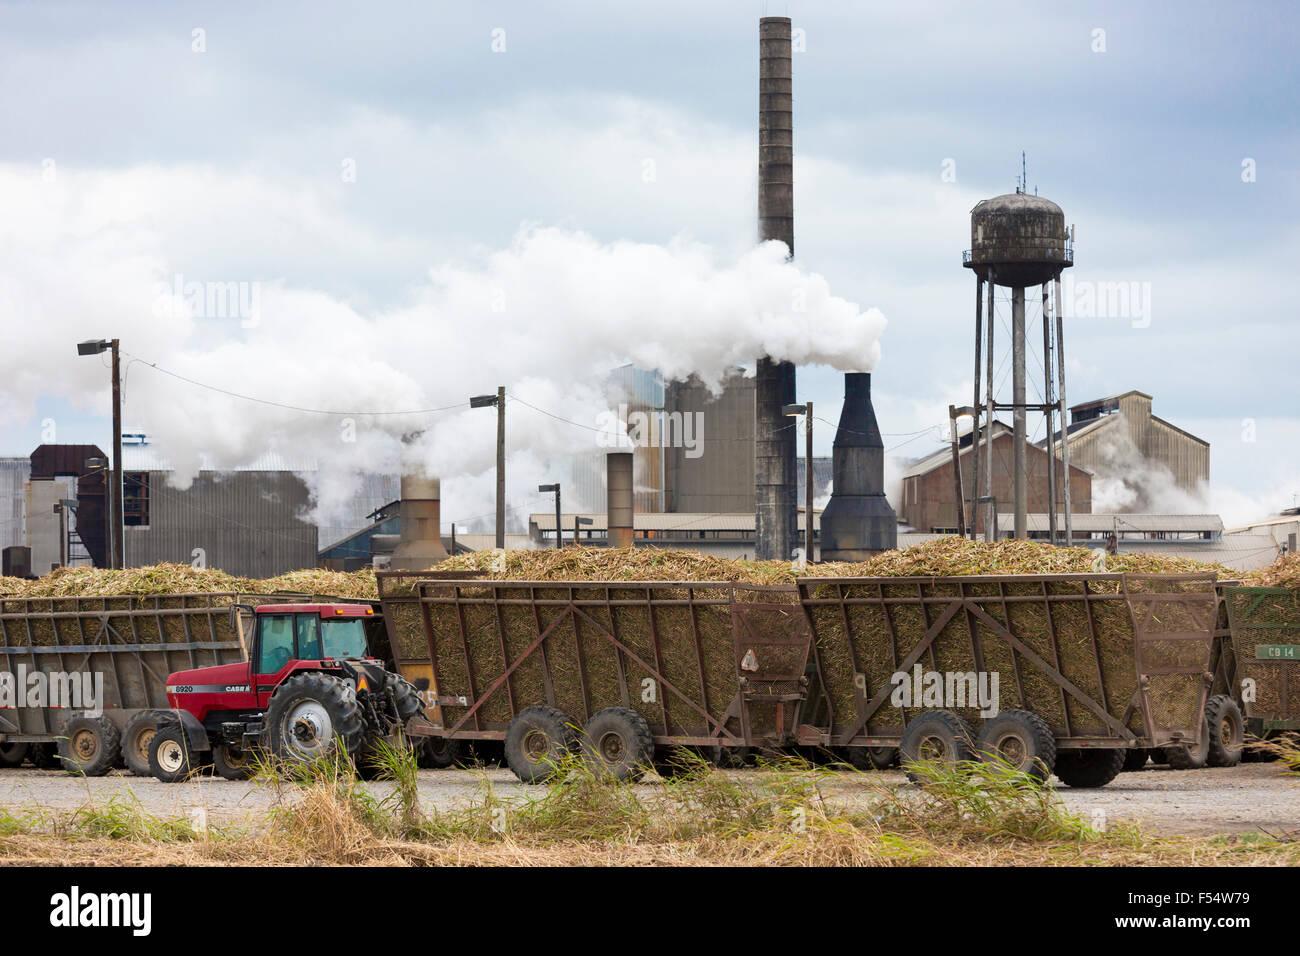 Zuckerrohr-Produktionsfabrik St Mary Zucker Cooperative Sugar Mill Verarbeitung roher Zucker in Jeanerette, Louisiana, Stockbild